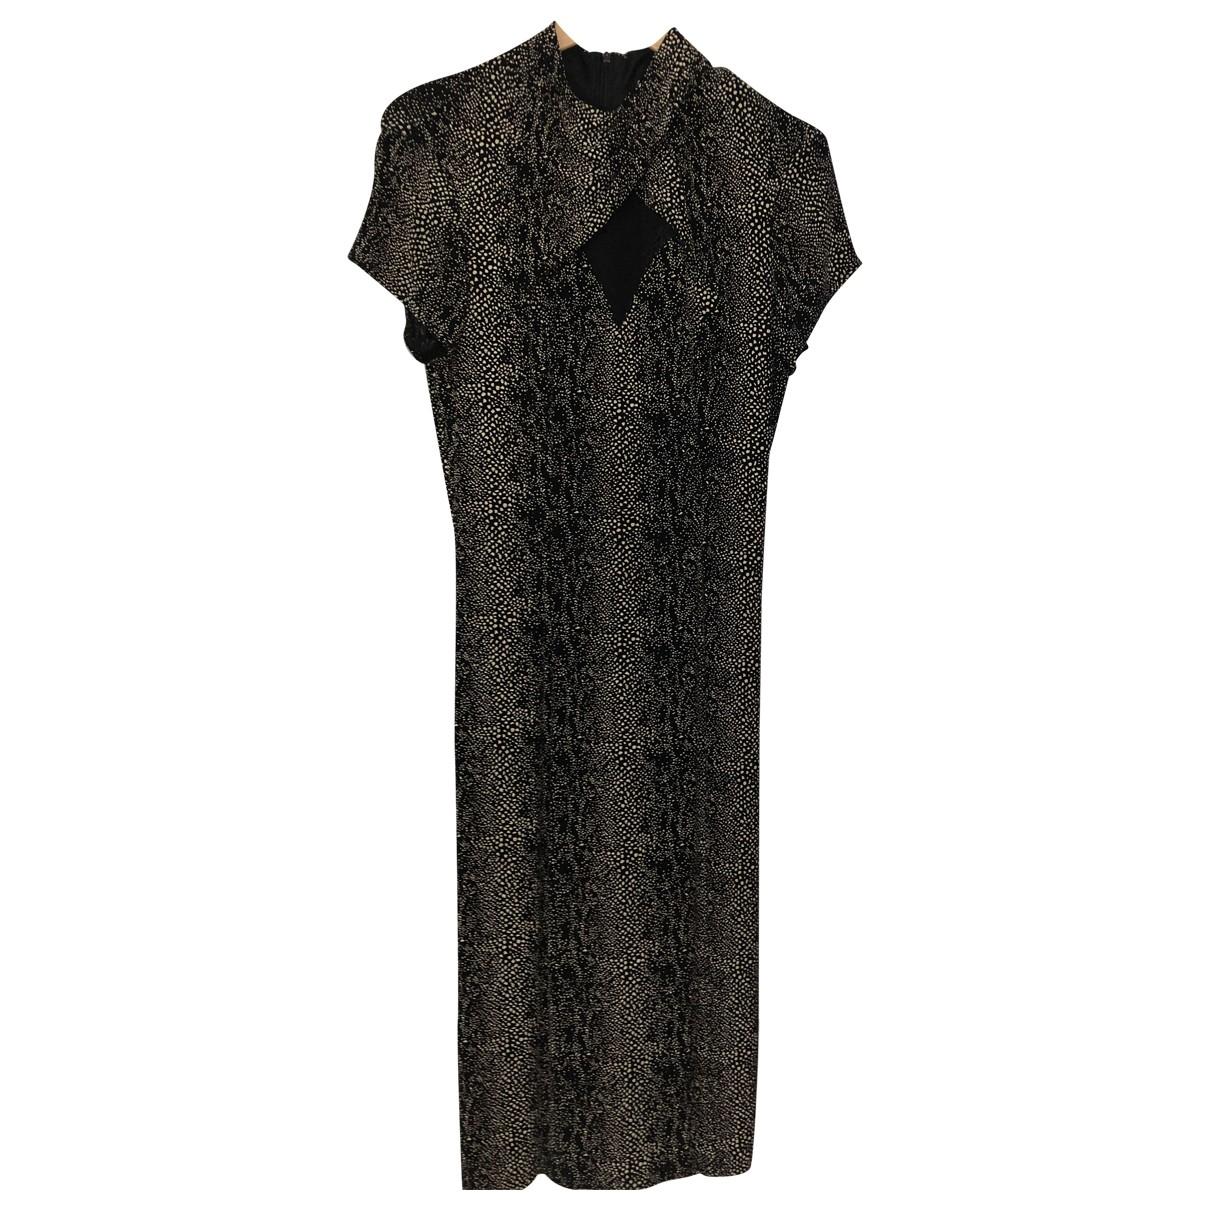 Joseph Ribkoff \N Black dress for Women 12 UK